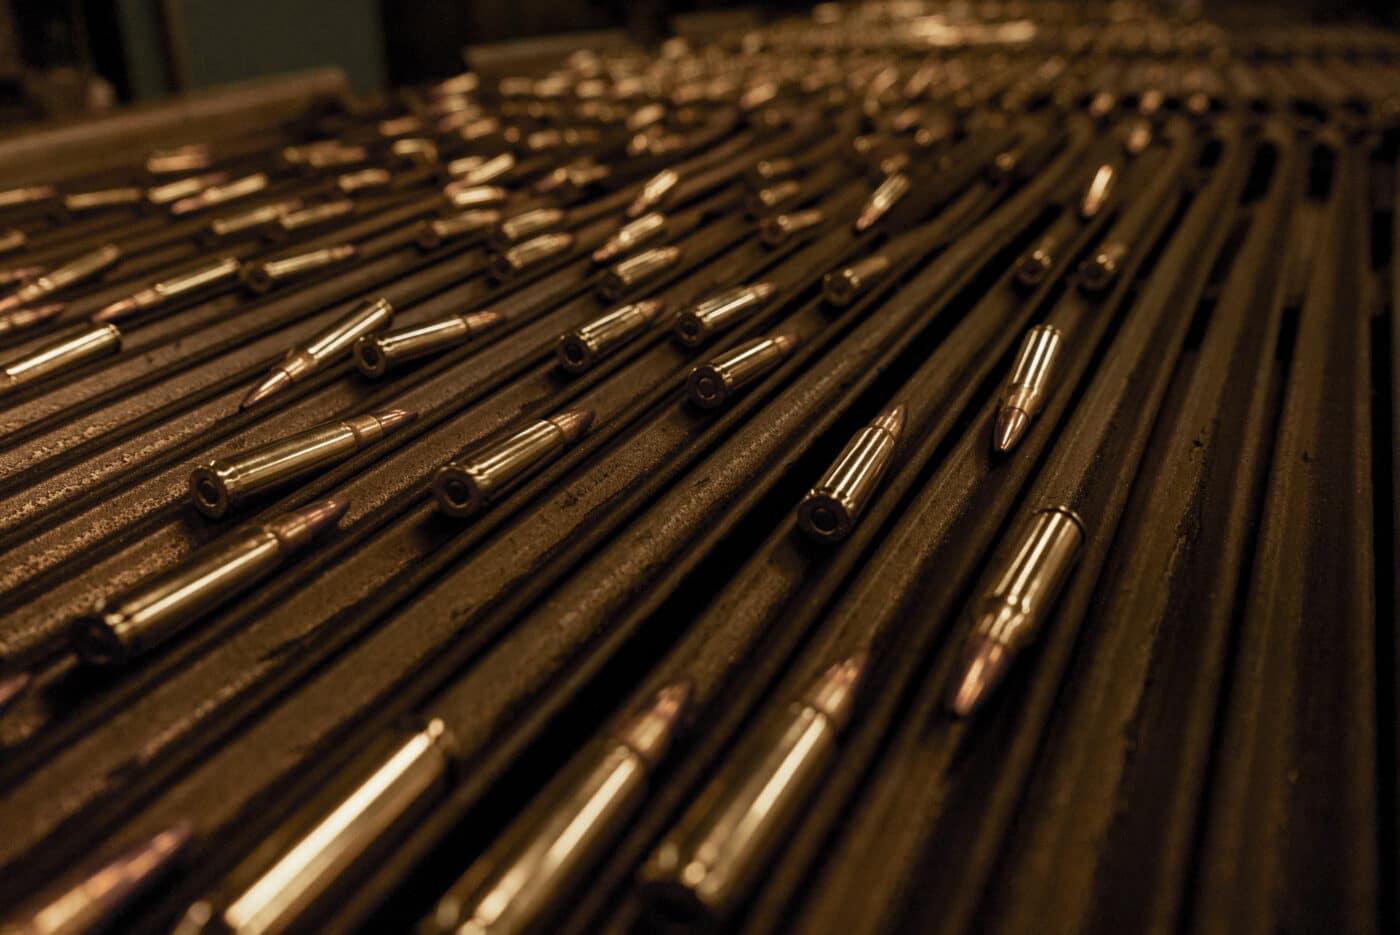 Remington Ammunition being made